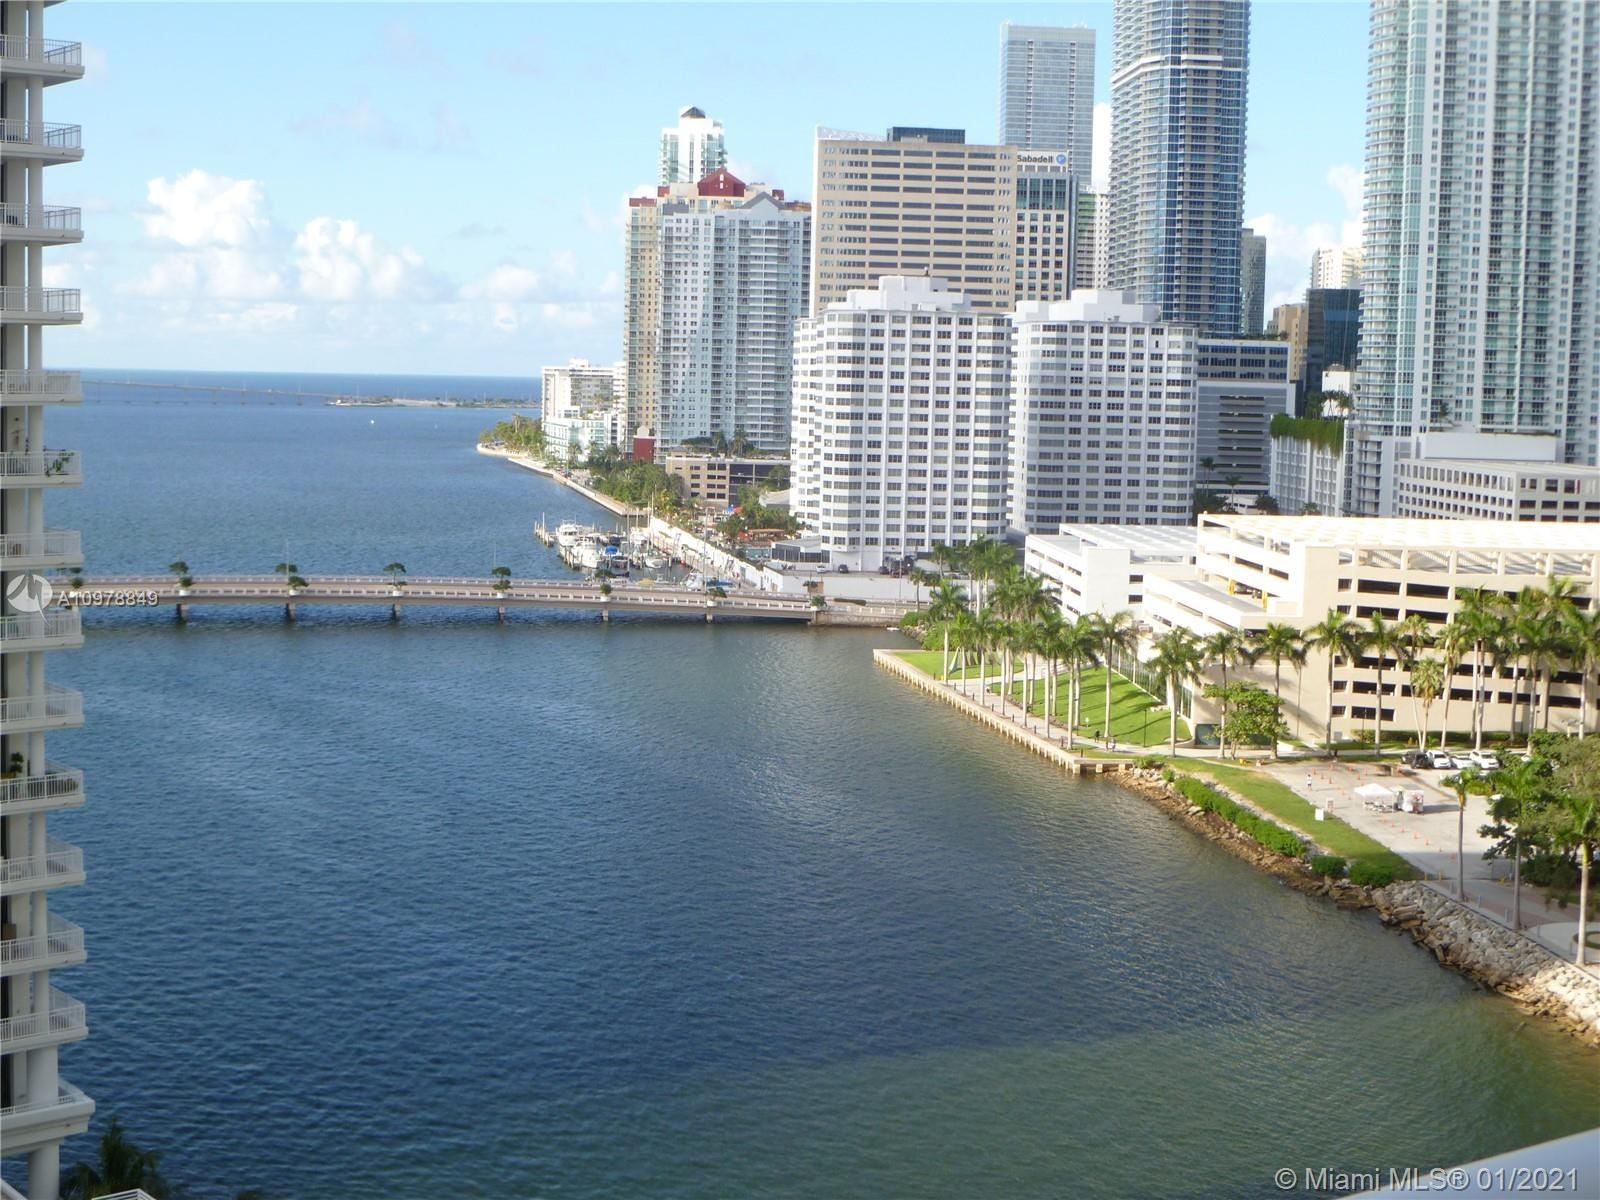 901 Brickell Key Blvd #1503, Miami, FL 33131 - #: A10978849